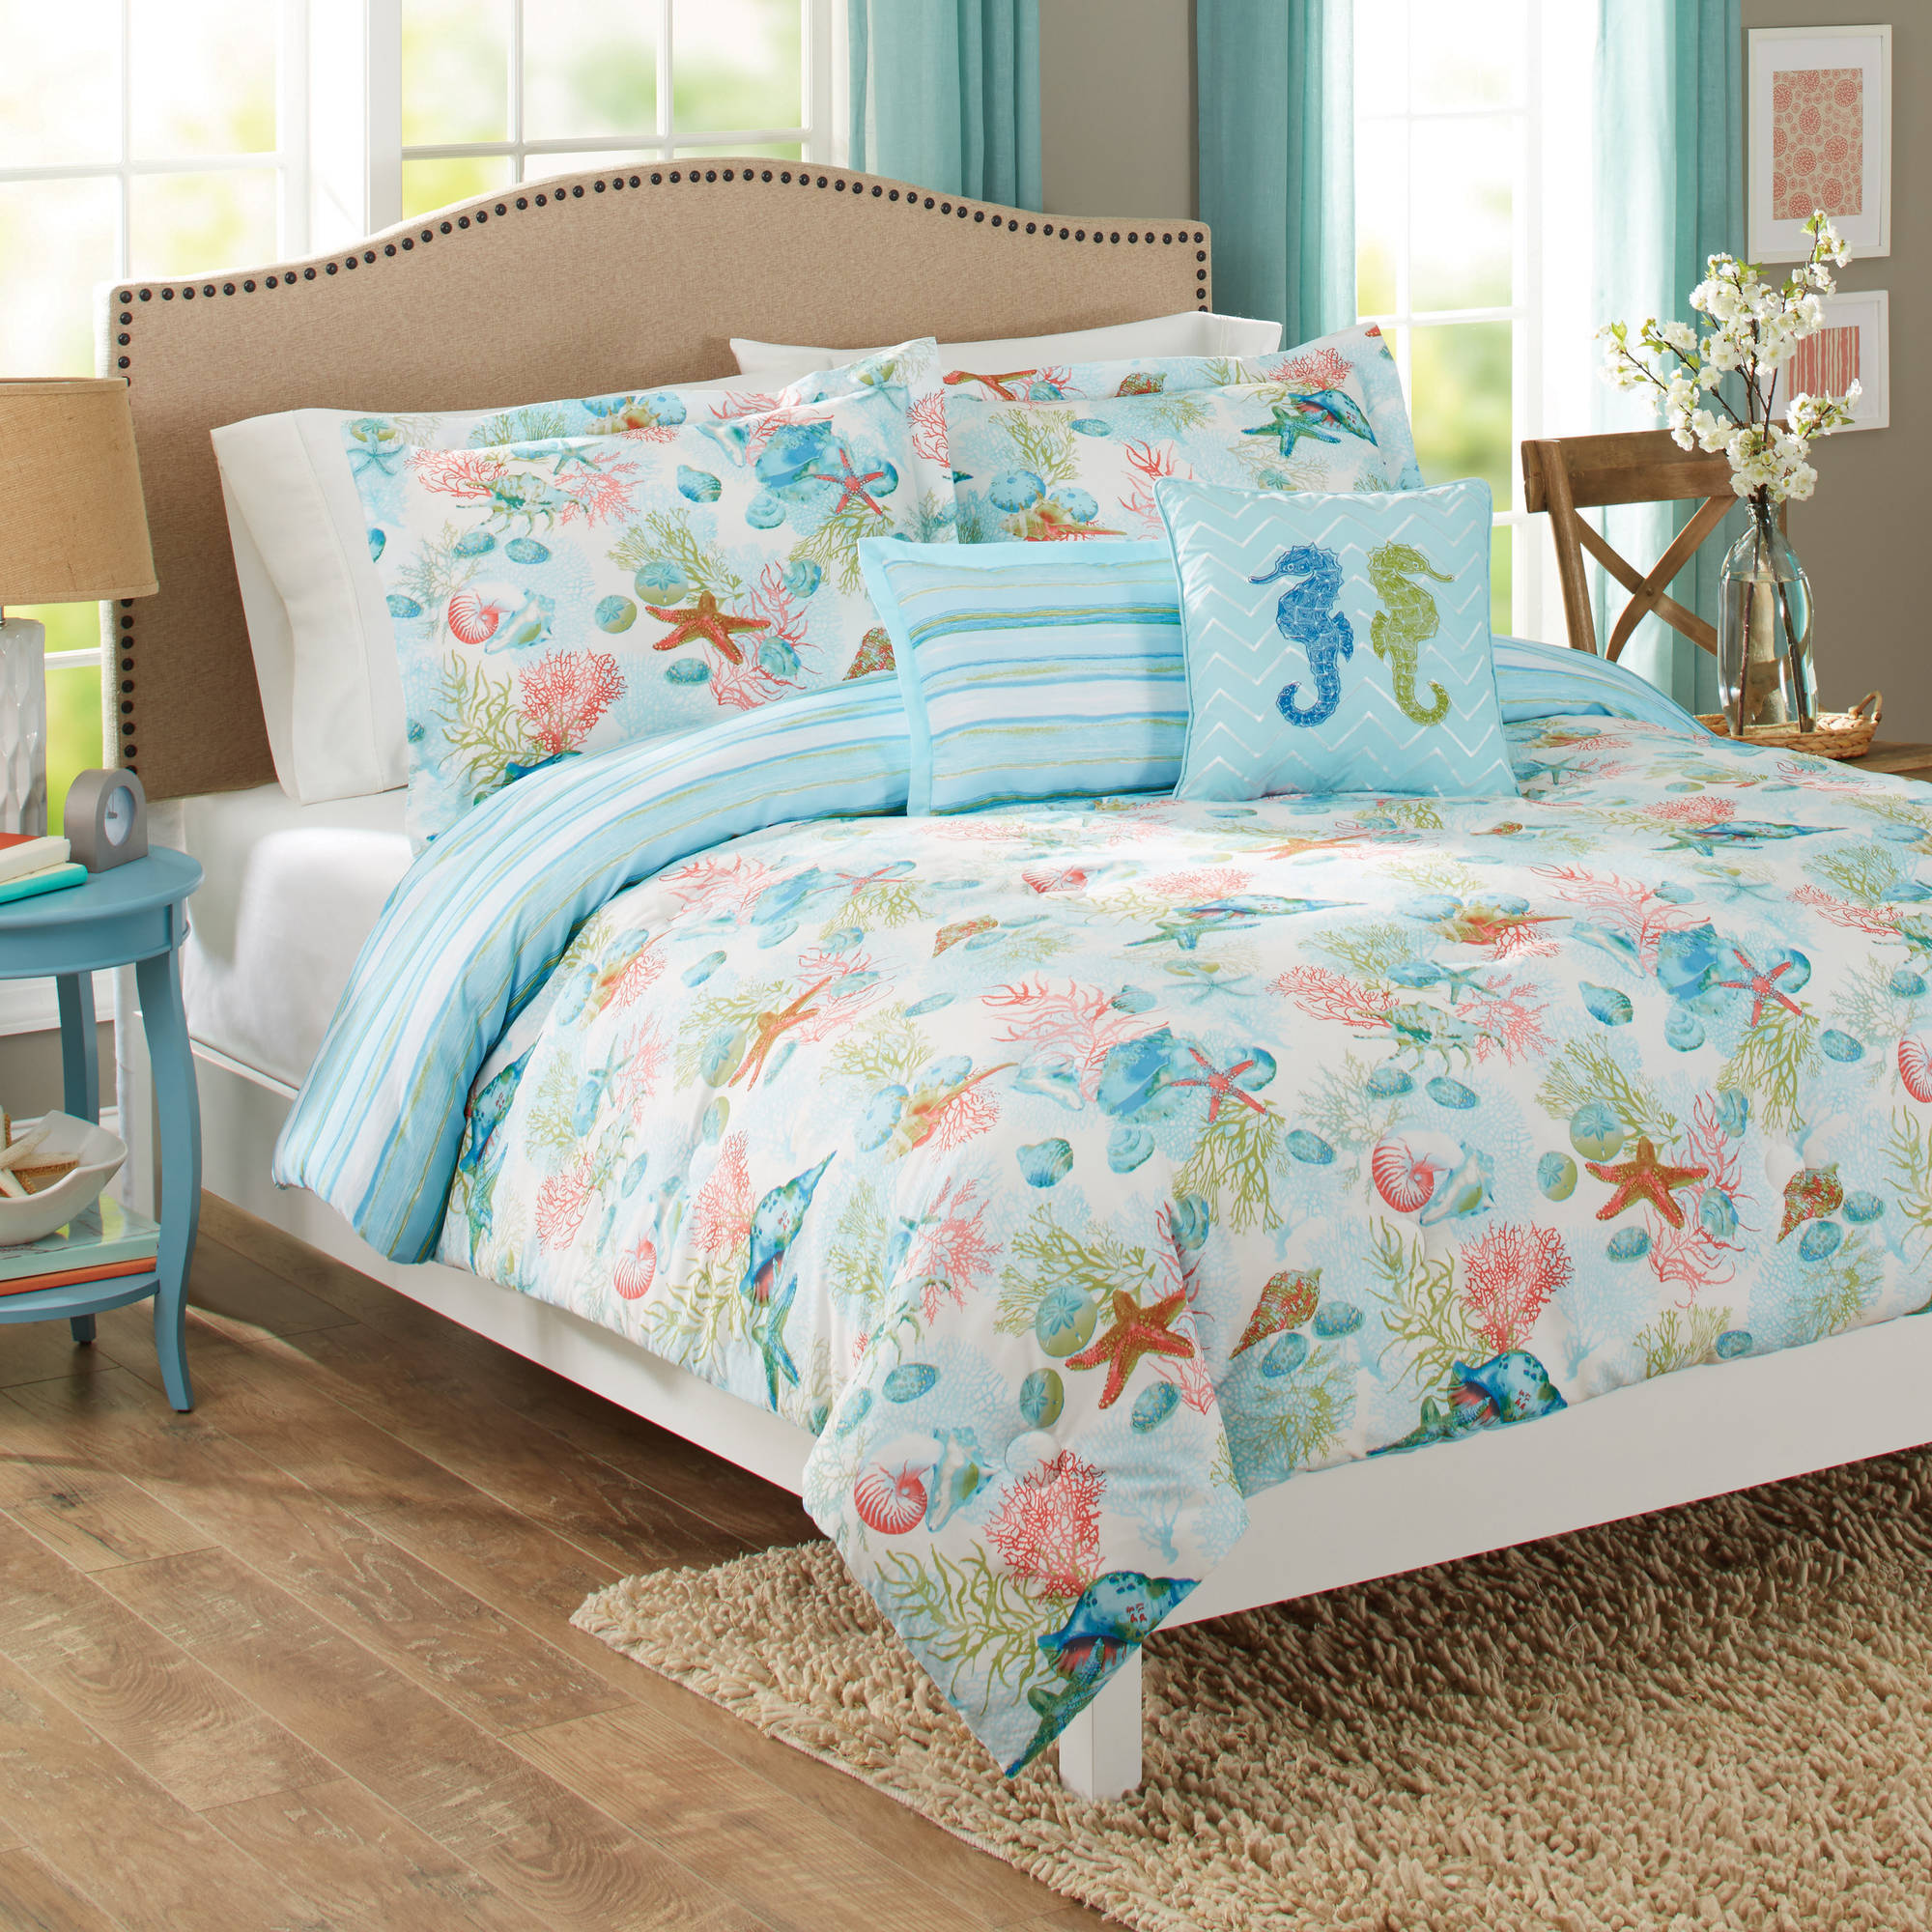 Better Homes and Gardens Beach Day 5-Piece Comforter Set, Peach